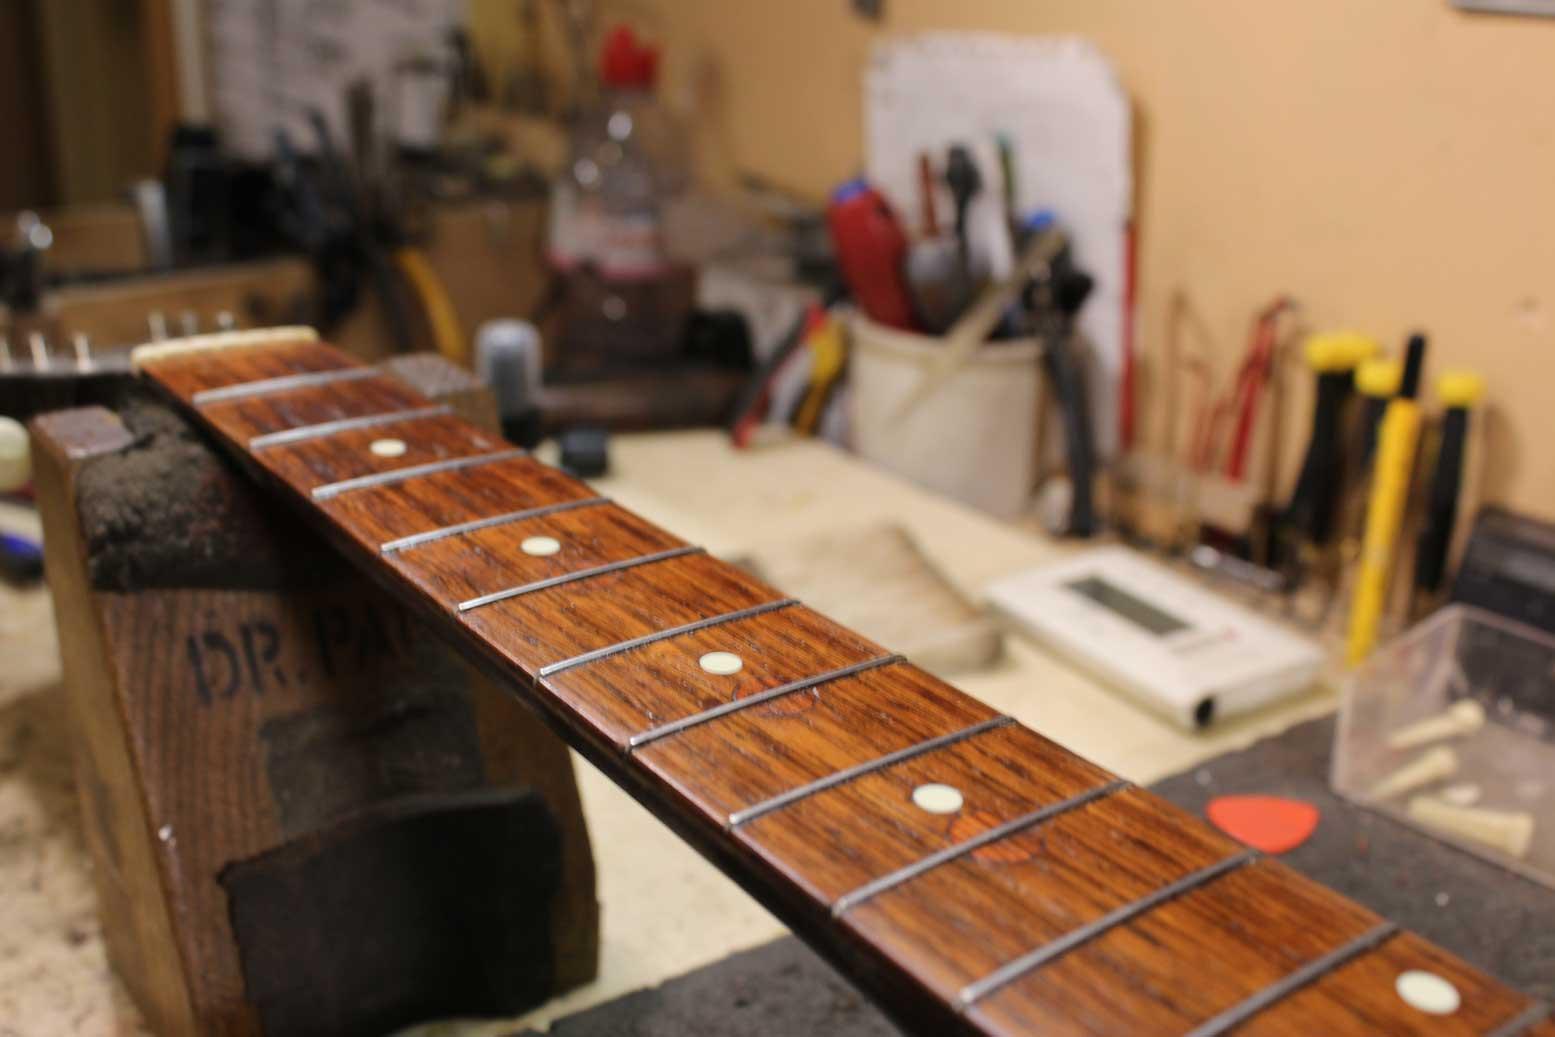 1931 Gibson L-0 (fretboard repair)